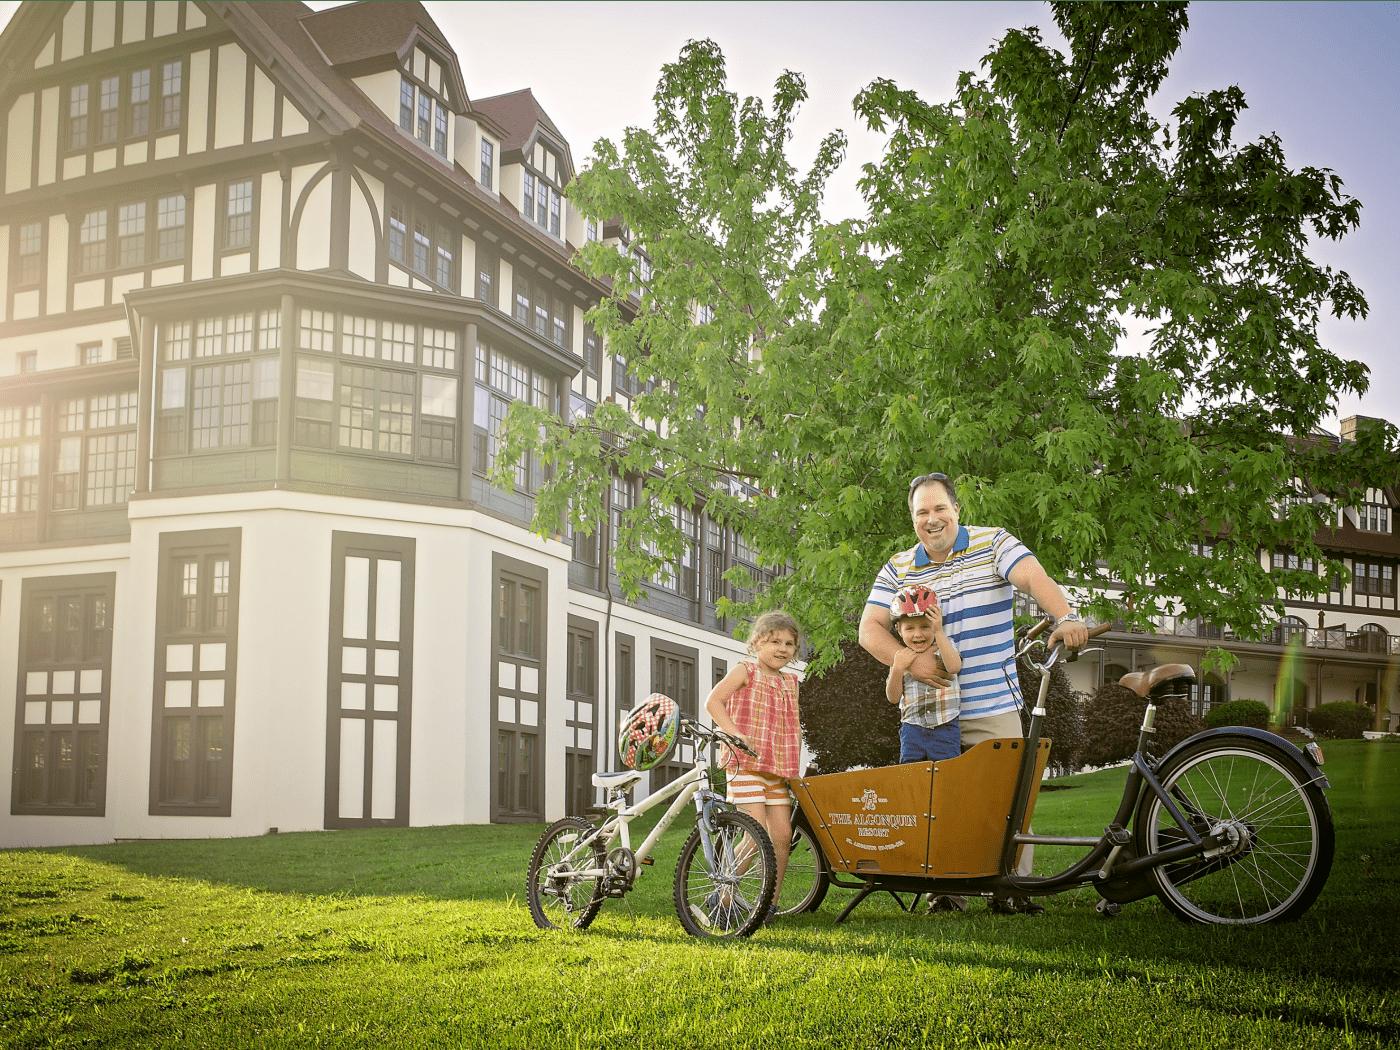 Algonquin Resort bike rentals